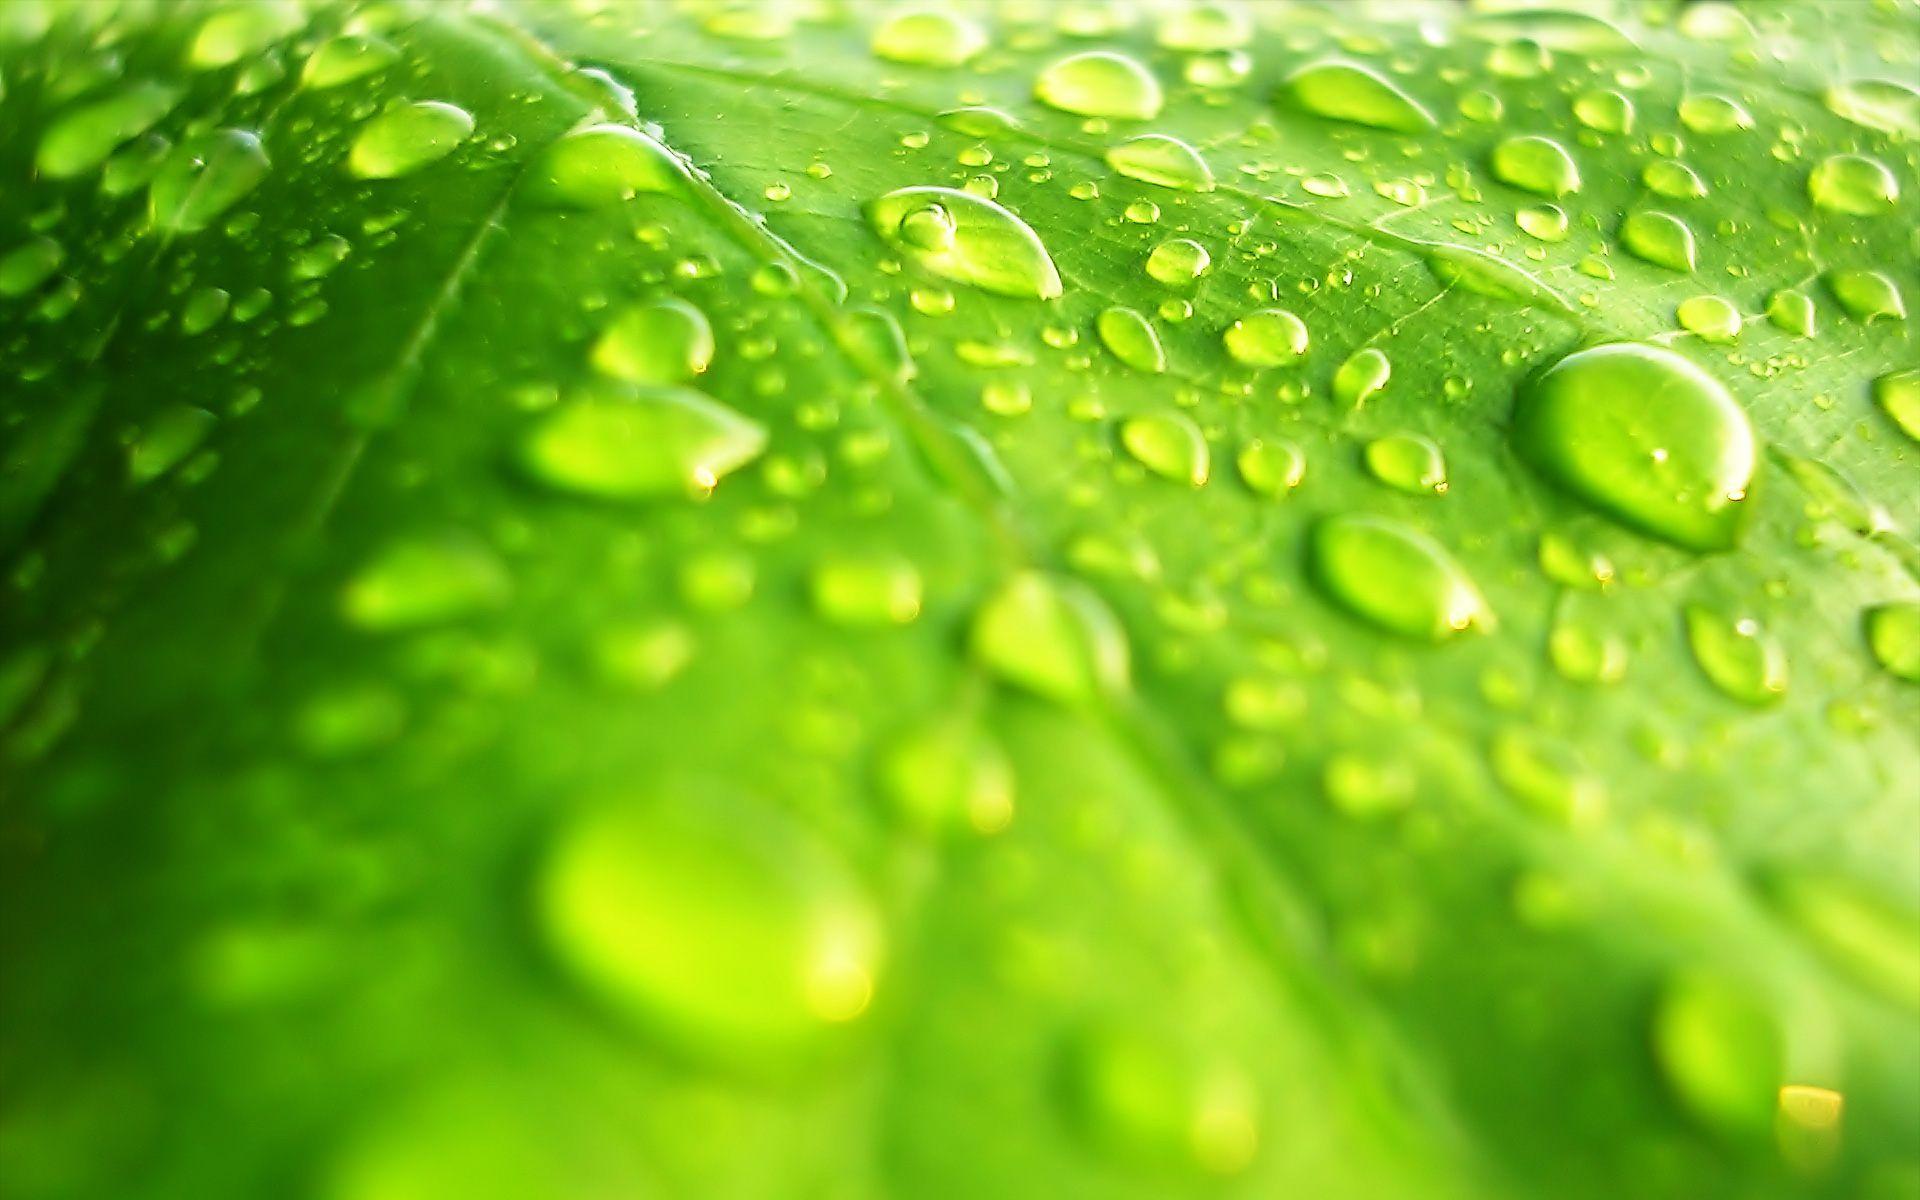 Raindrops On A Green Leaf HD desktop wallpaper High Definition